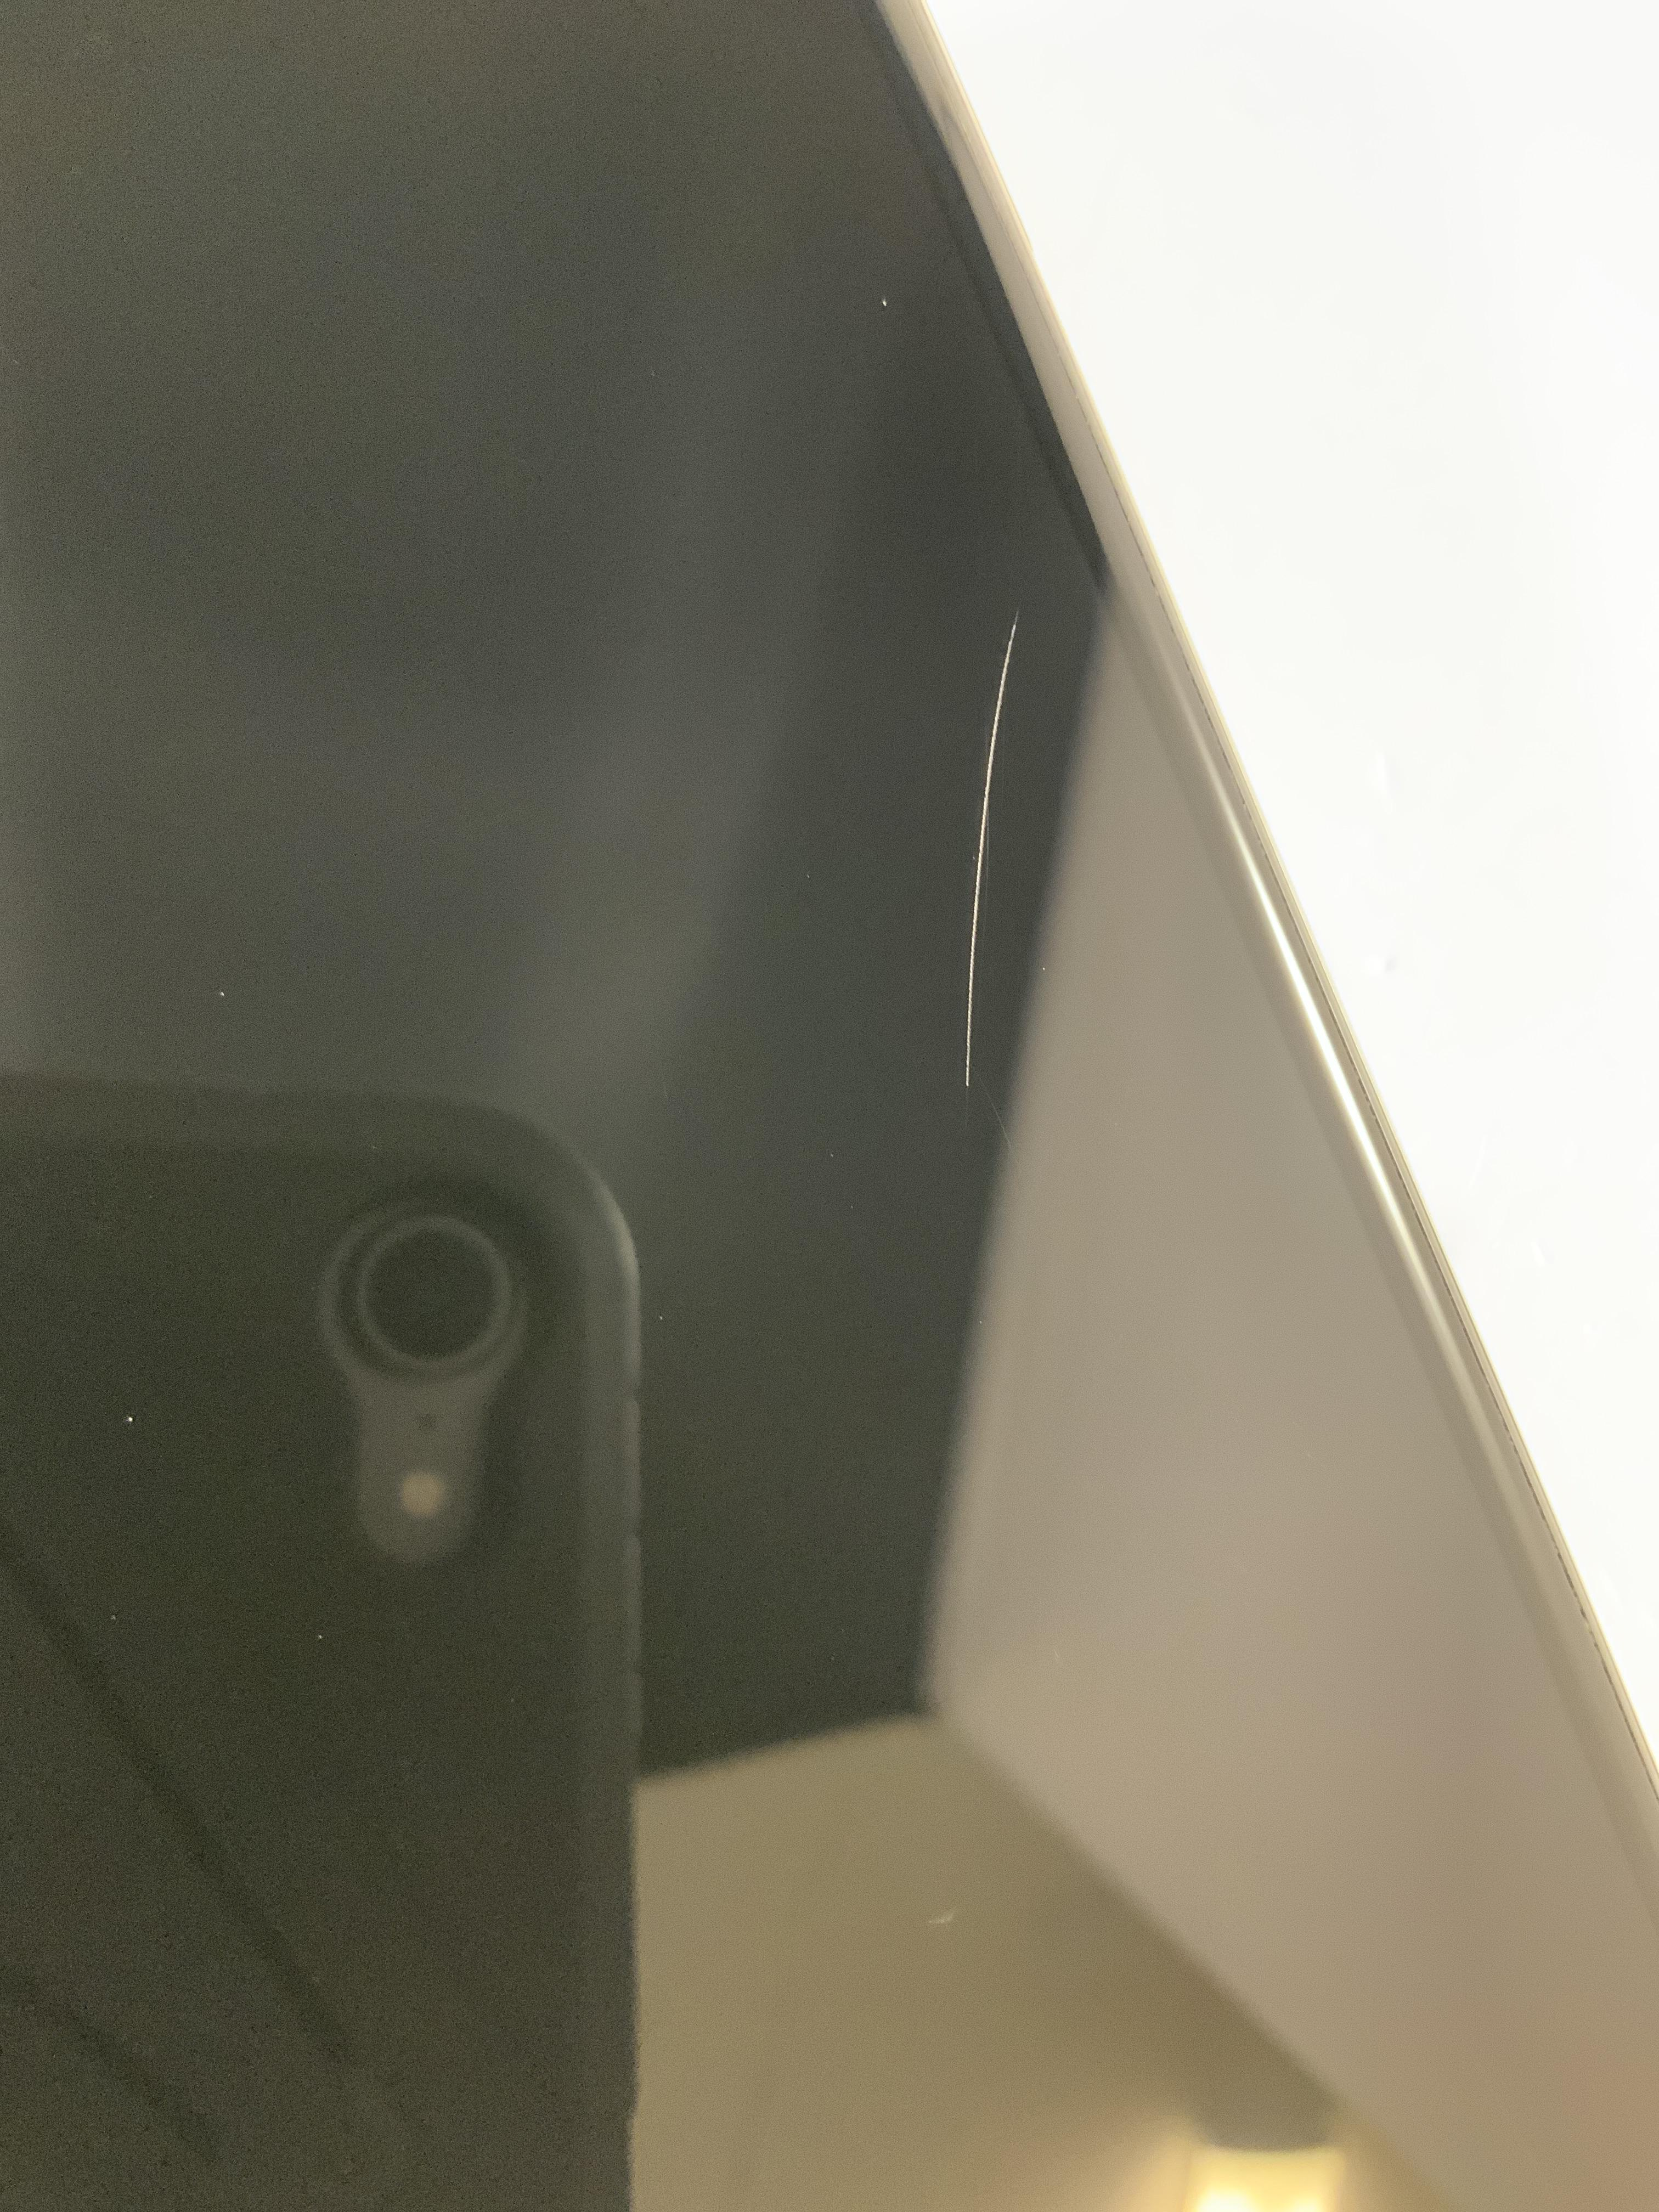 iPhone 11 Pro Max 256GB, 256GB, Space Gray, obraz 3